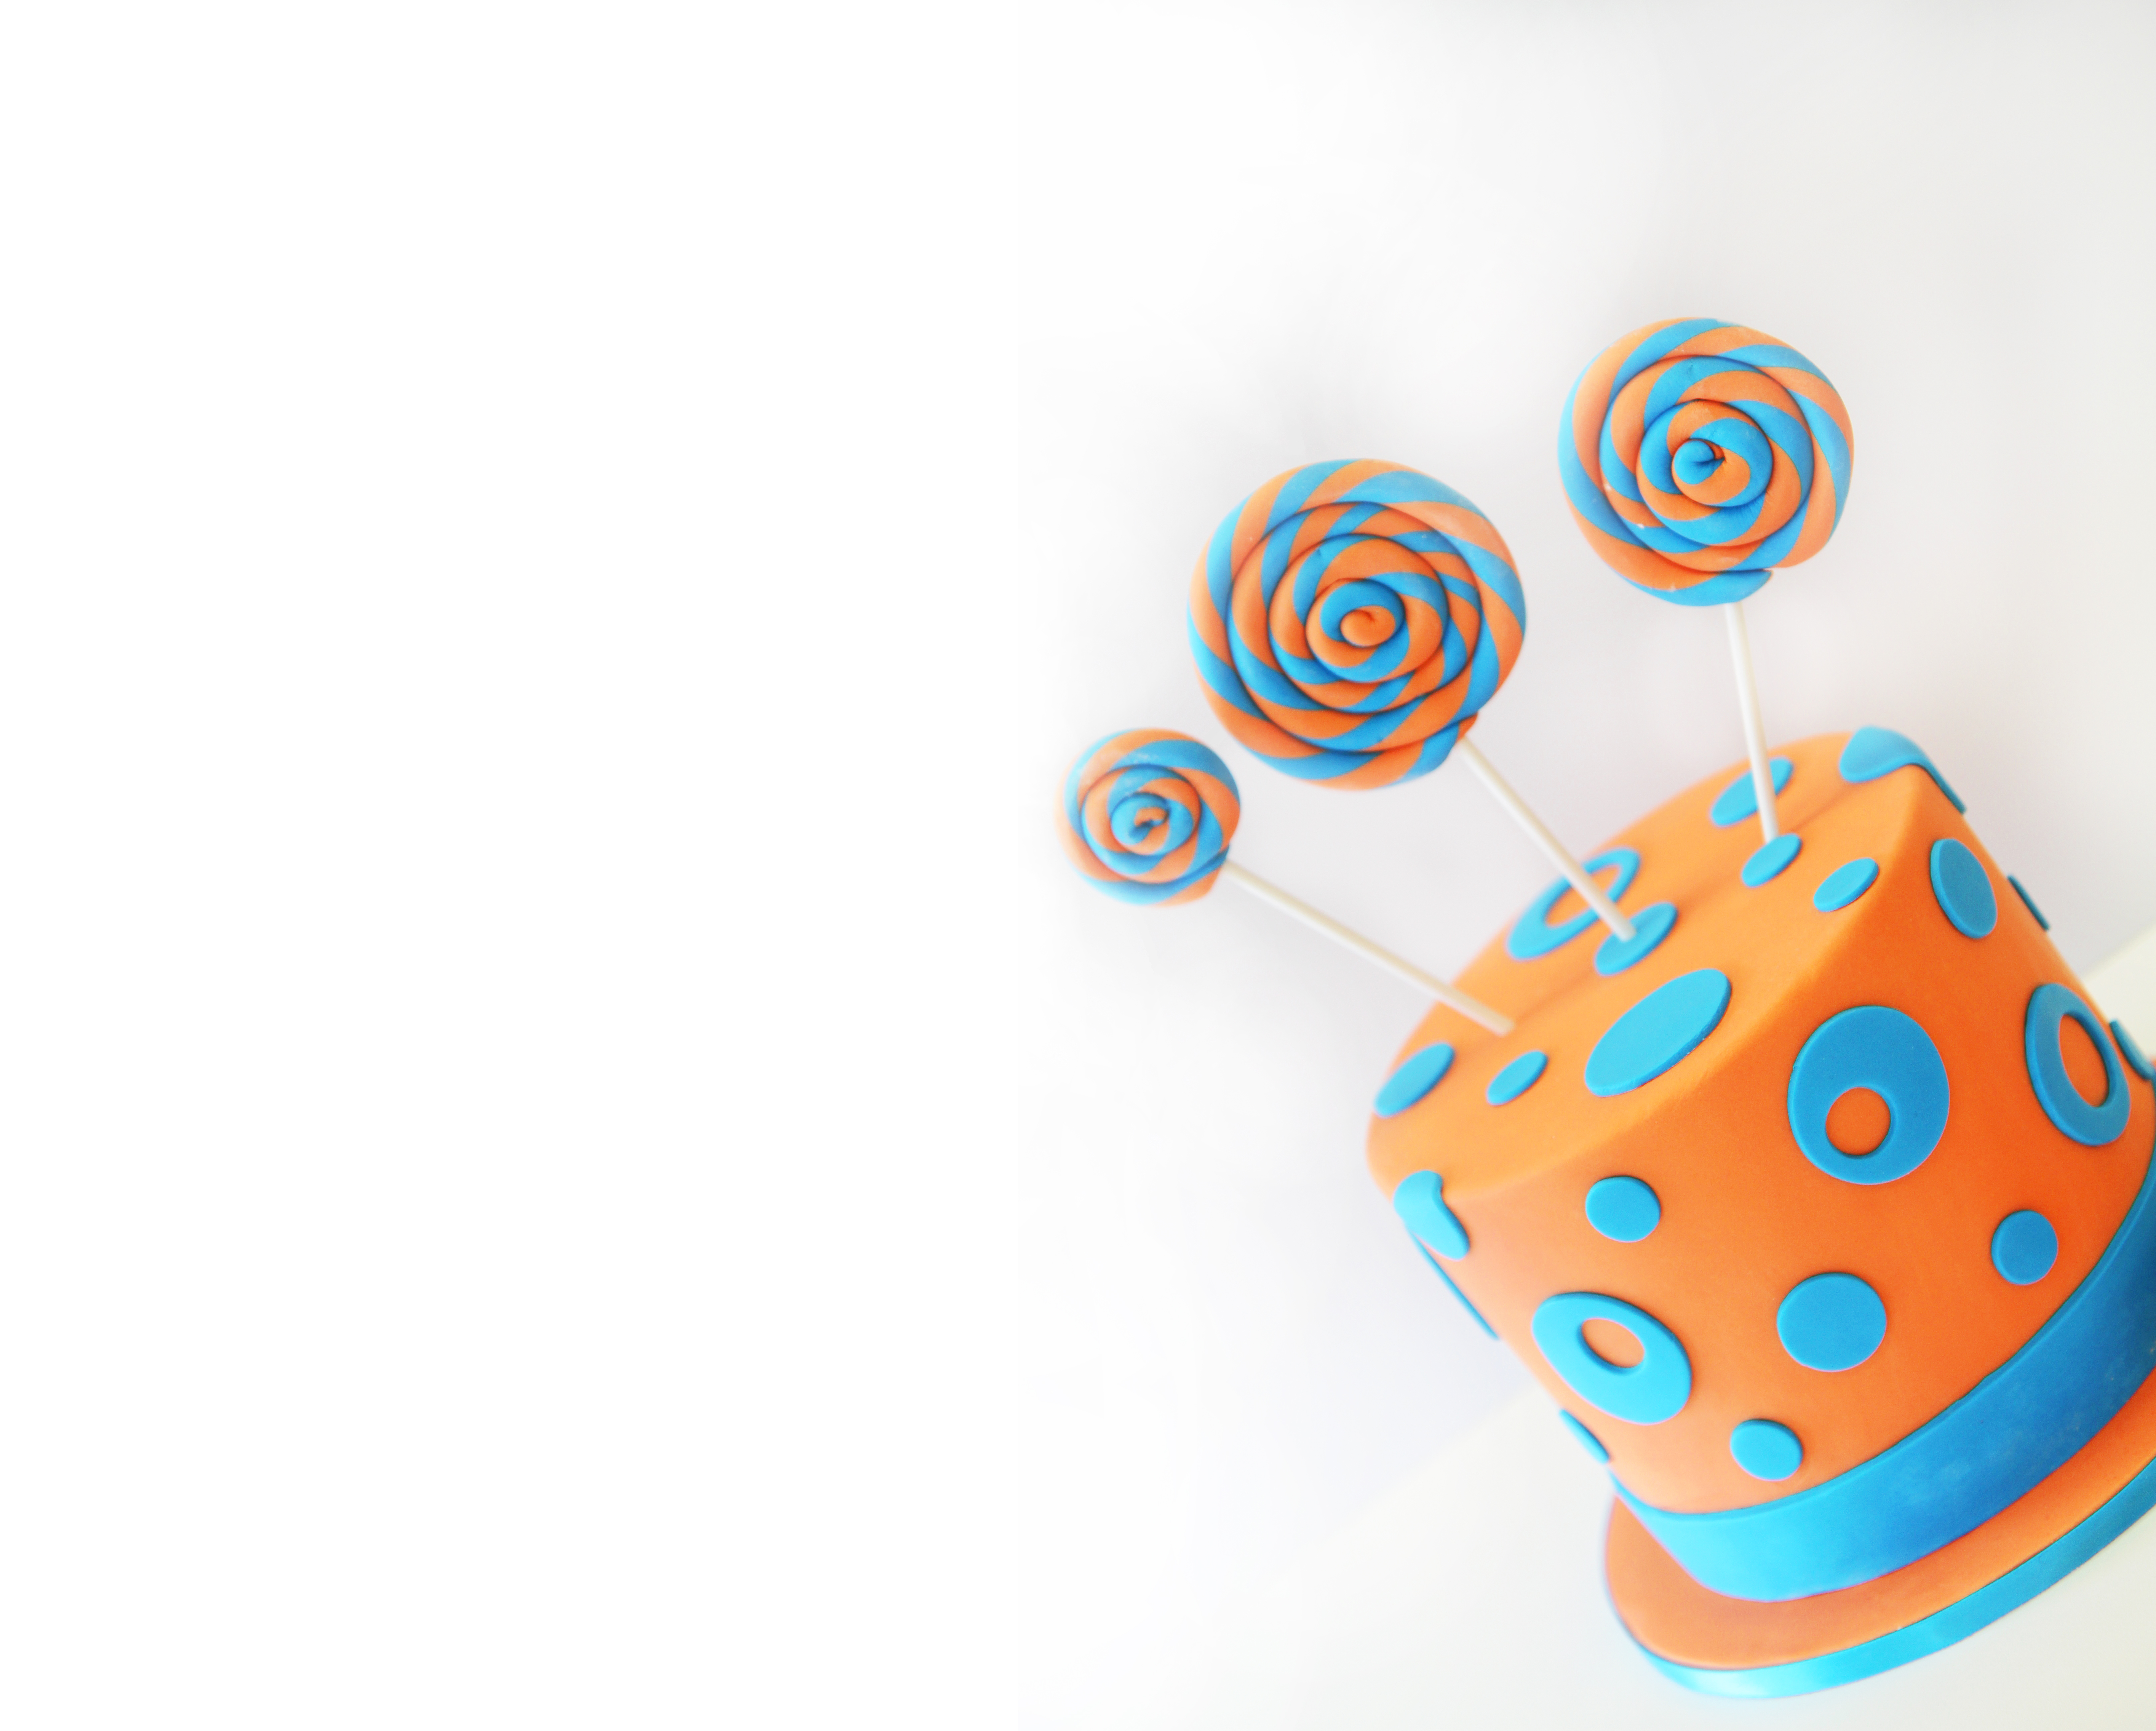 Lollipop-Step13_v2.jpg#asset:18076